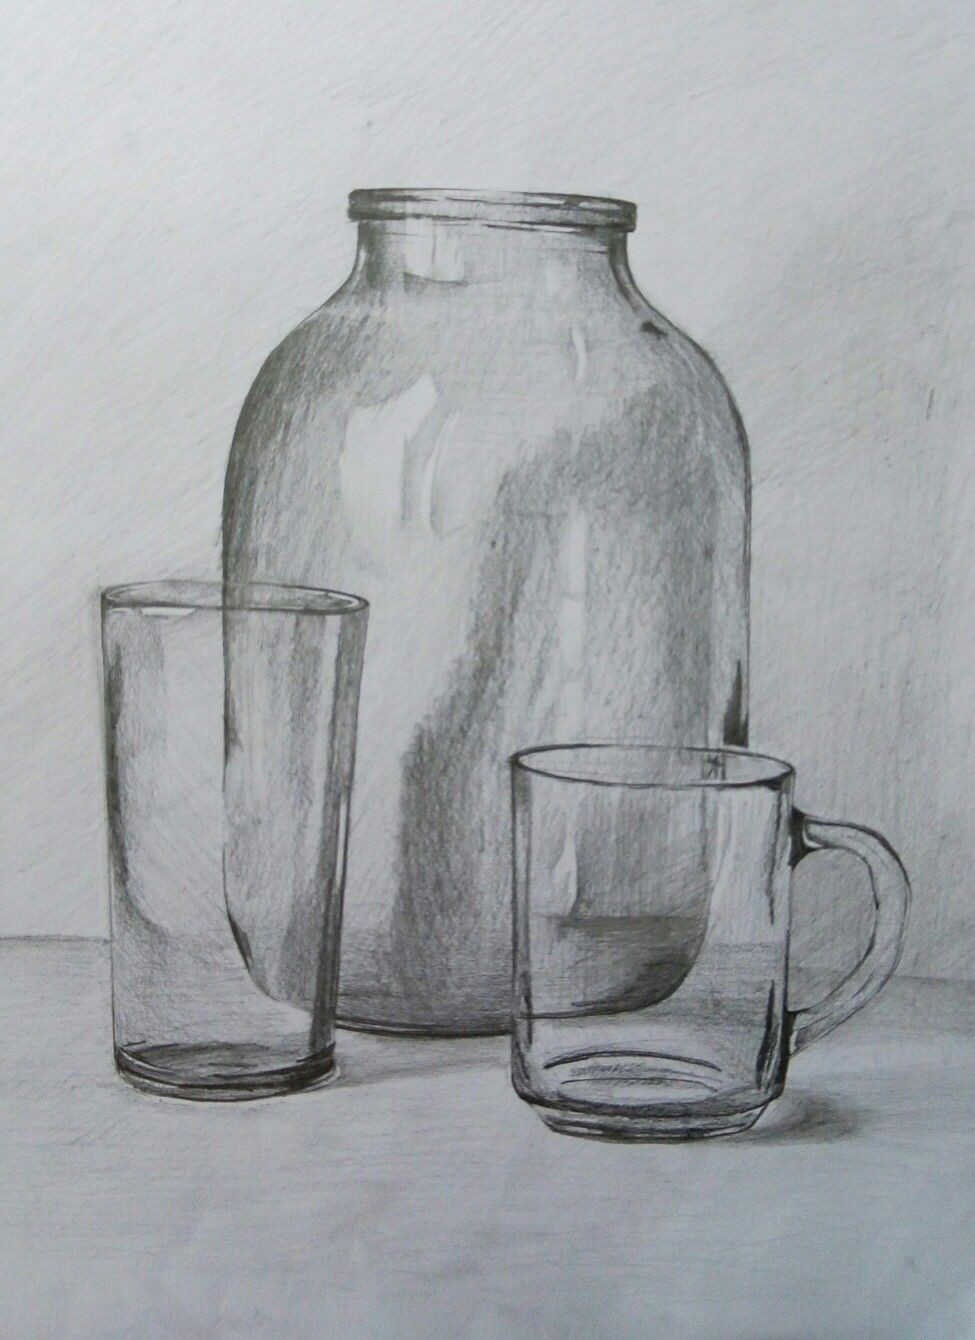 still life # drawing # drawing | Still life drawing, Life drawing, Still life sketch